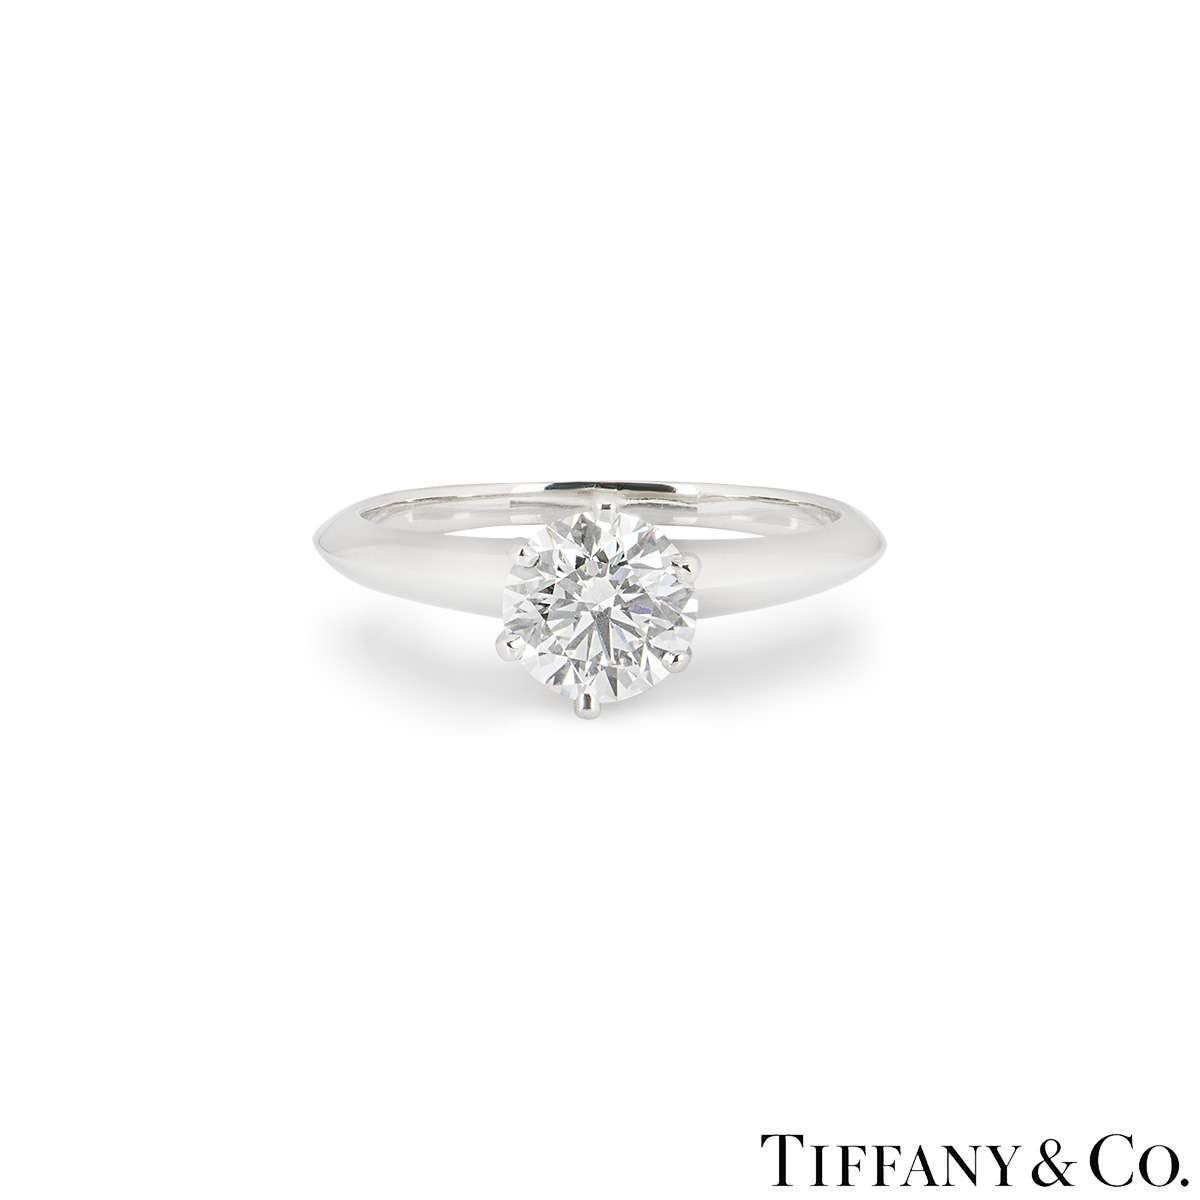 Tiffany & Co. Round Brilliant Cut Diamond Ring 1.14ct H/VVS1